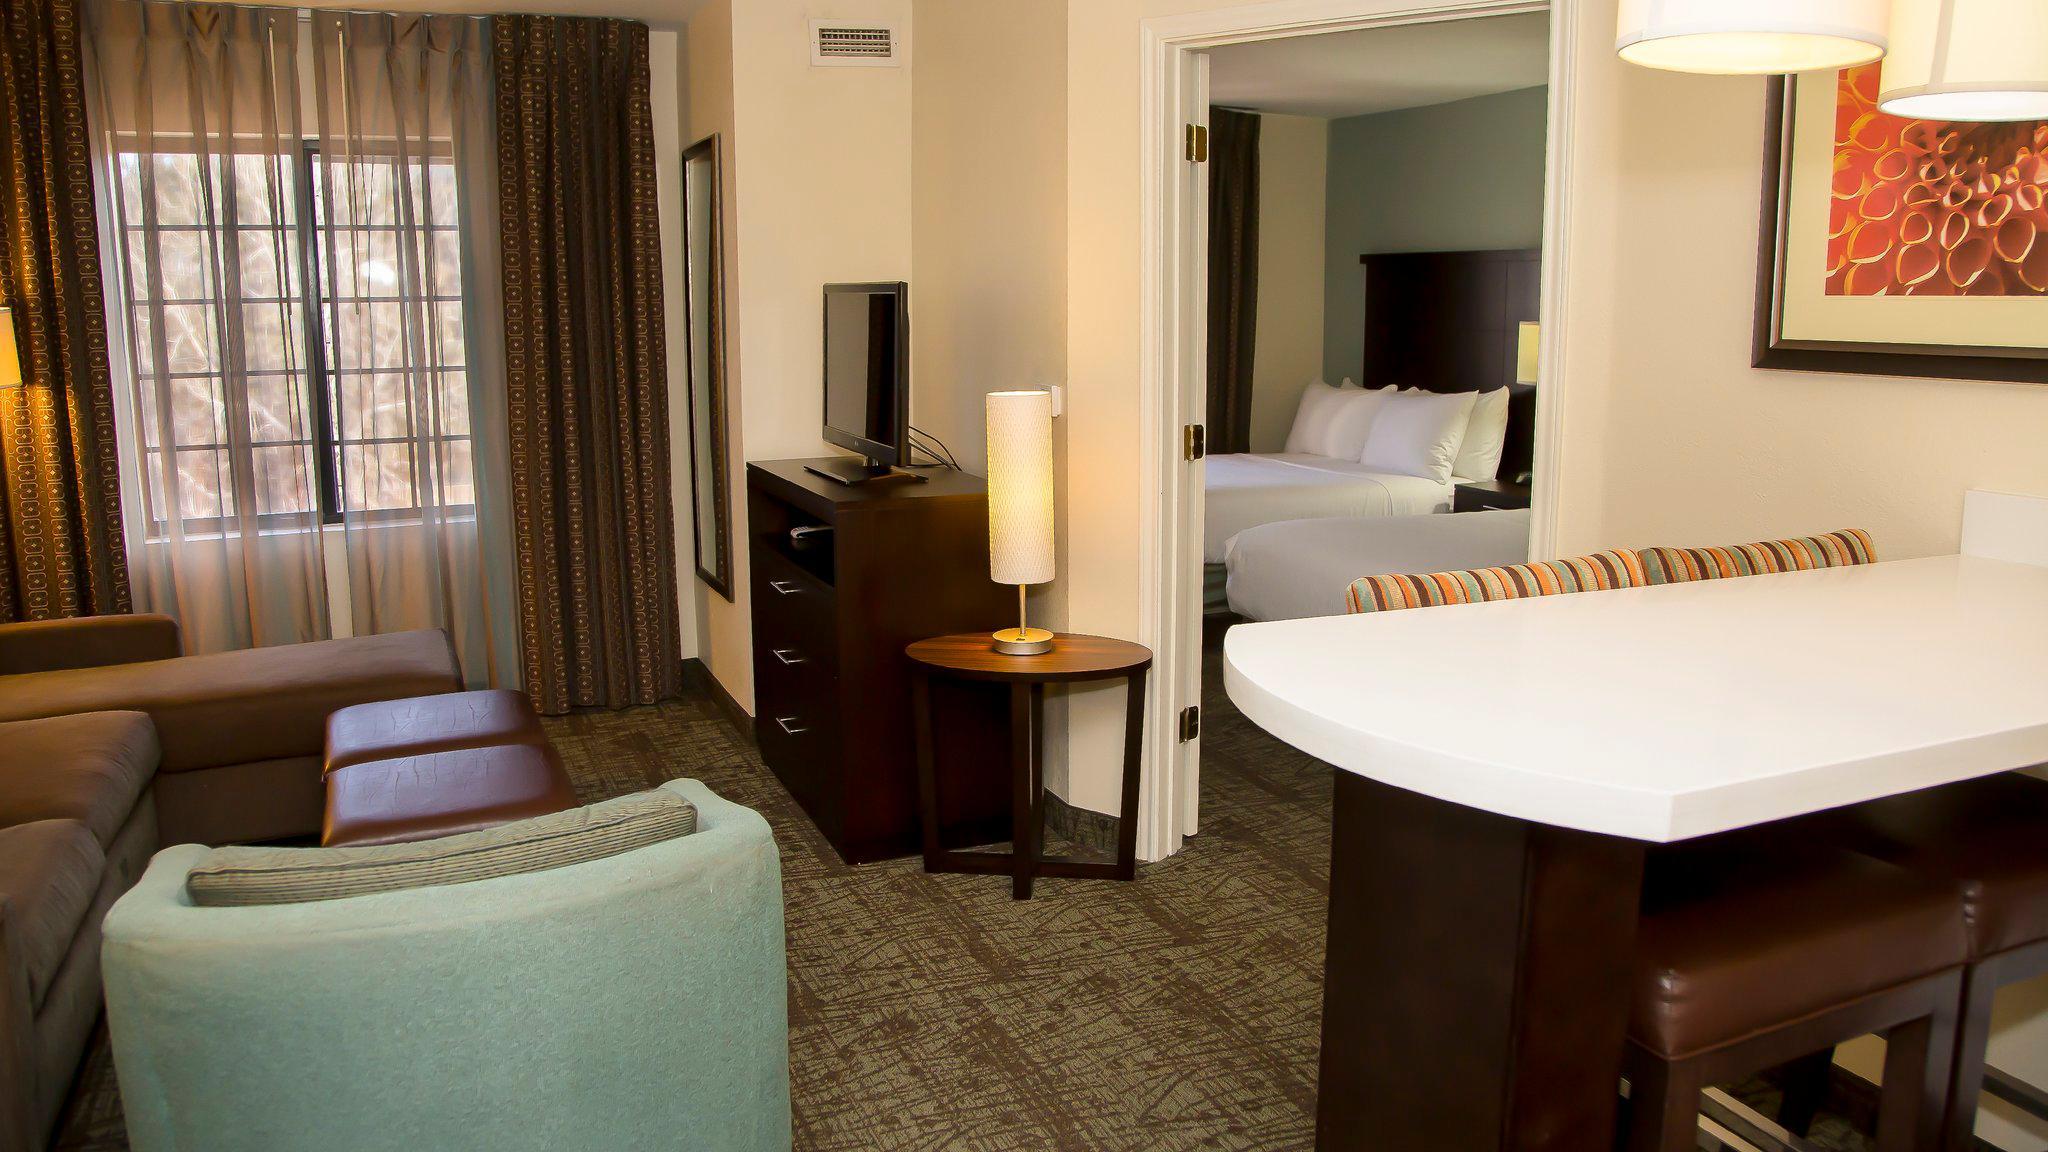 Staybridge Suites Colorado Springs North, an IHG Hotel